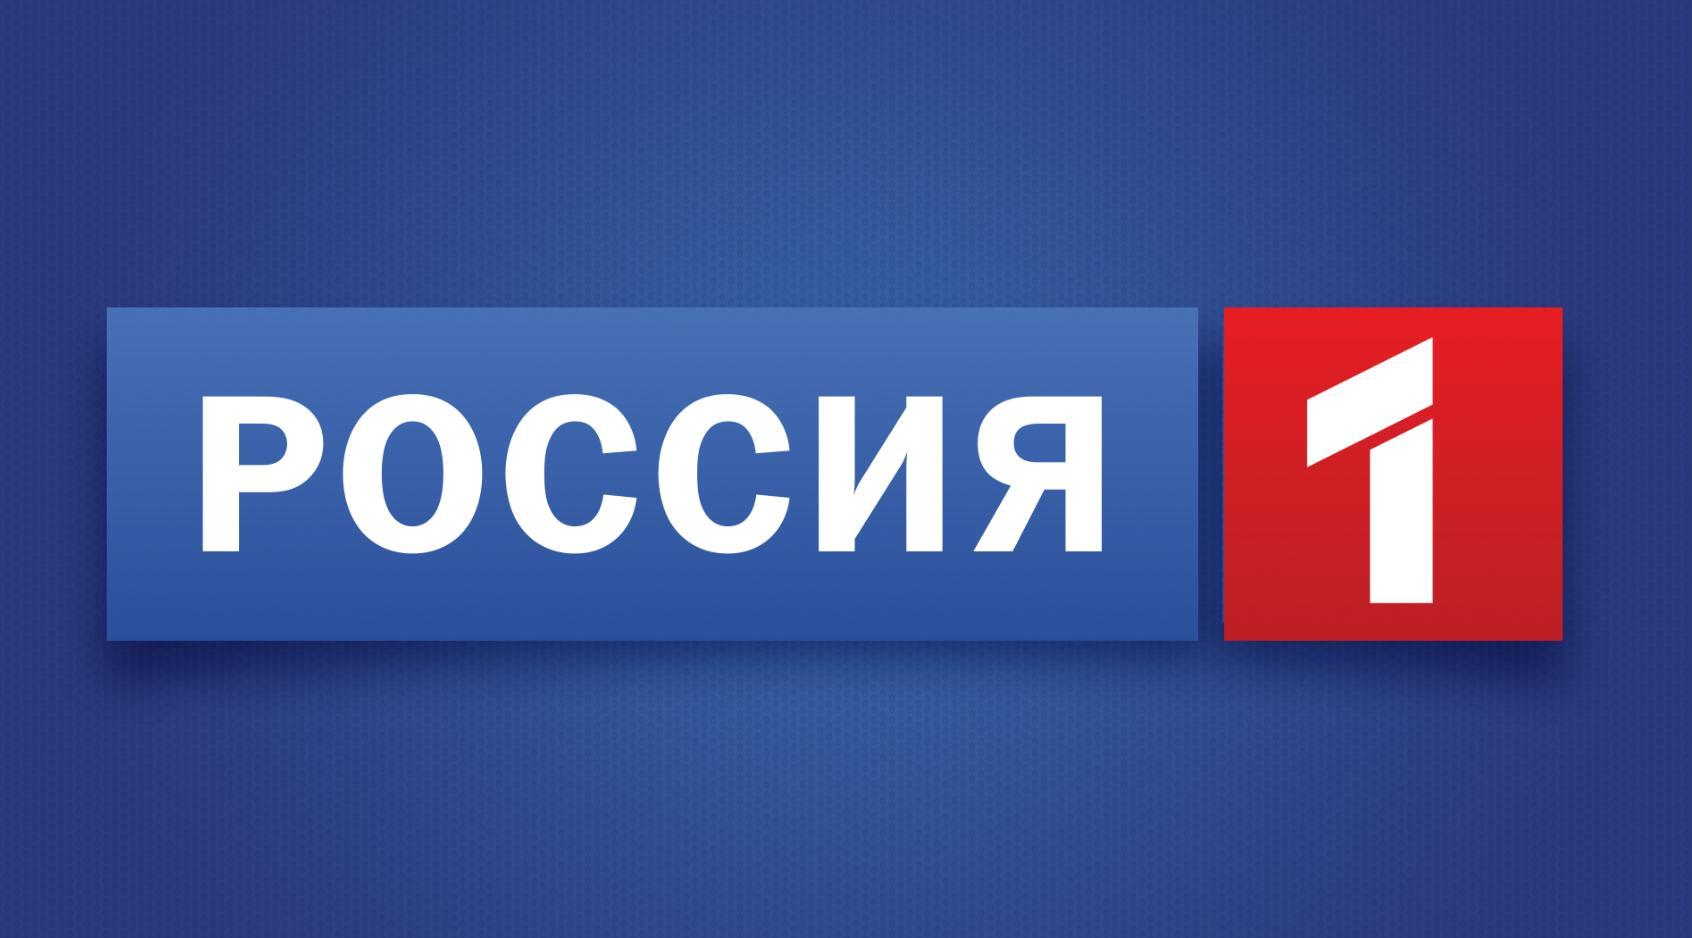 Программа передач россия 1 красноярск на сегодня